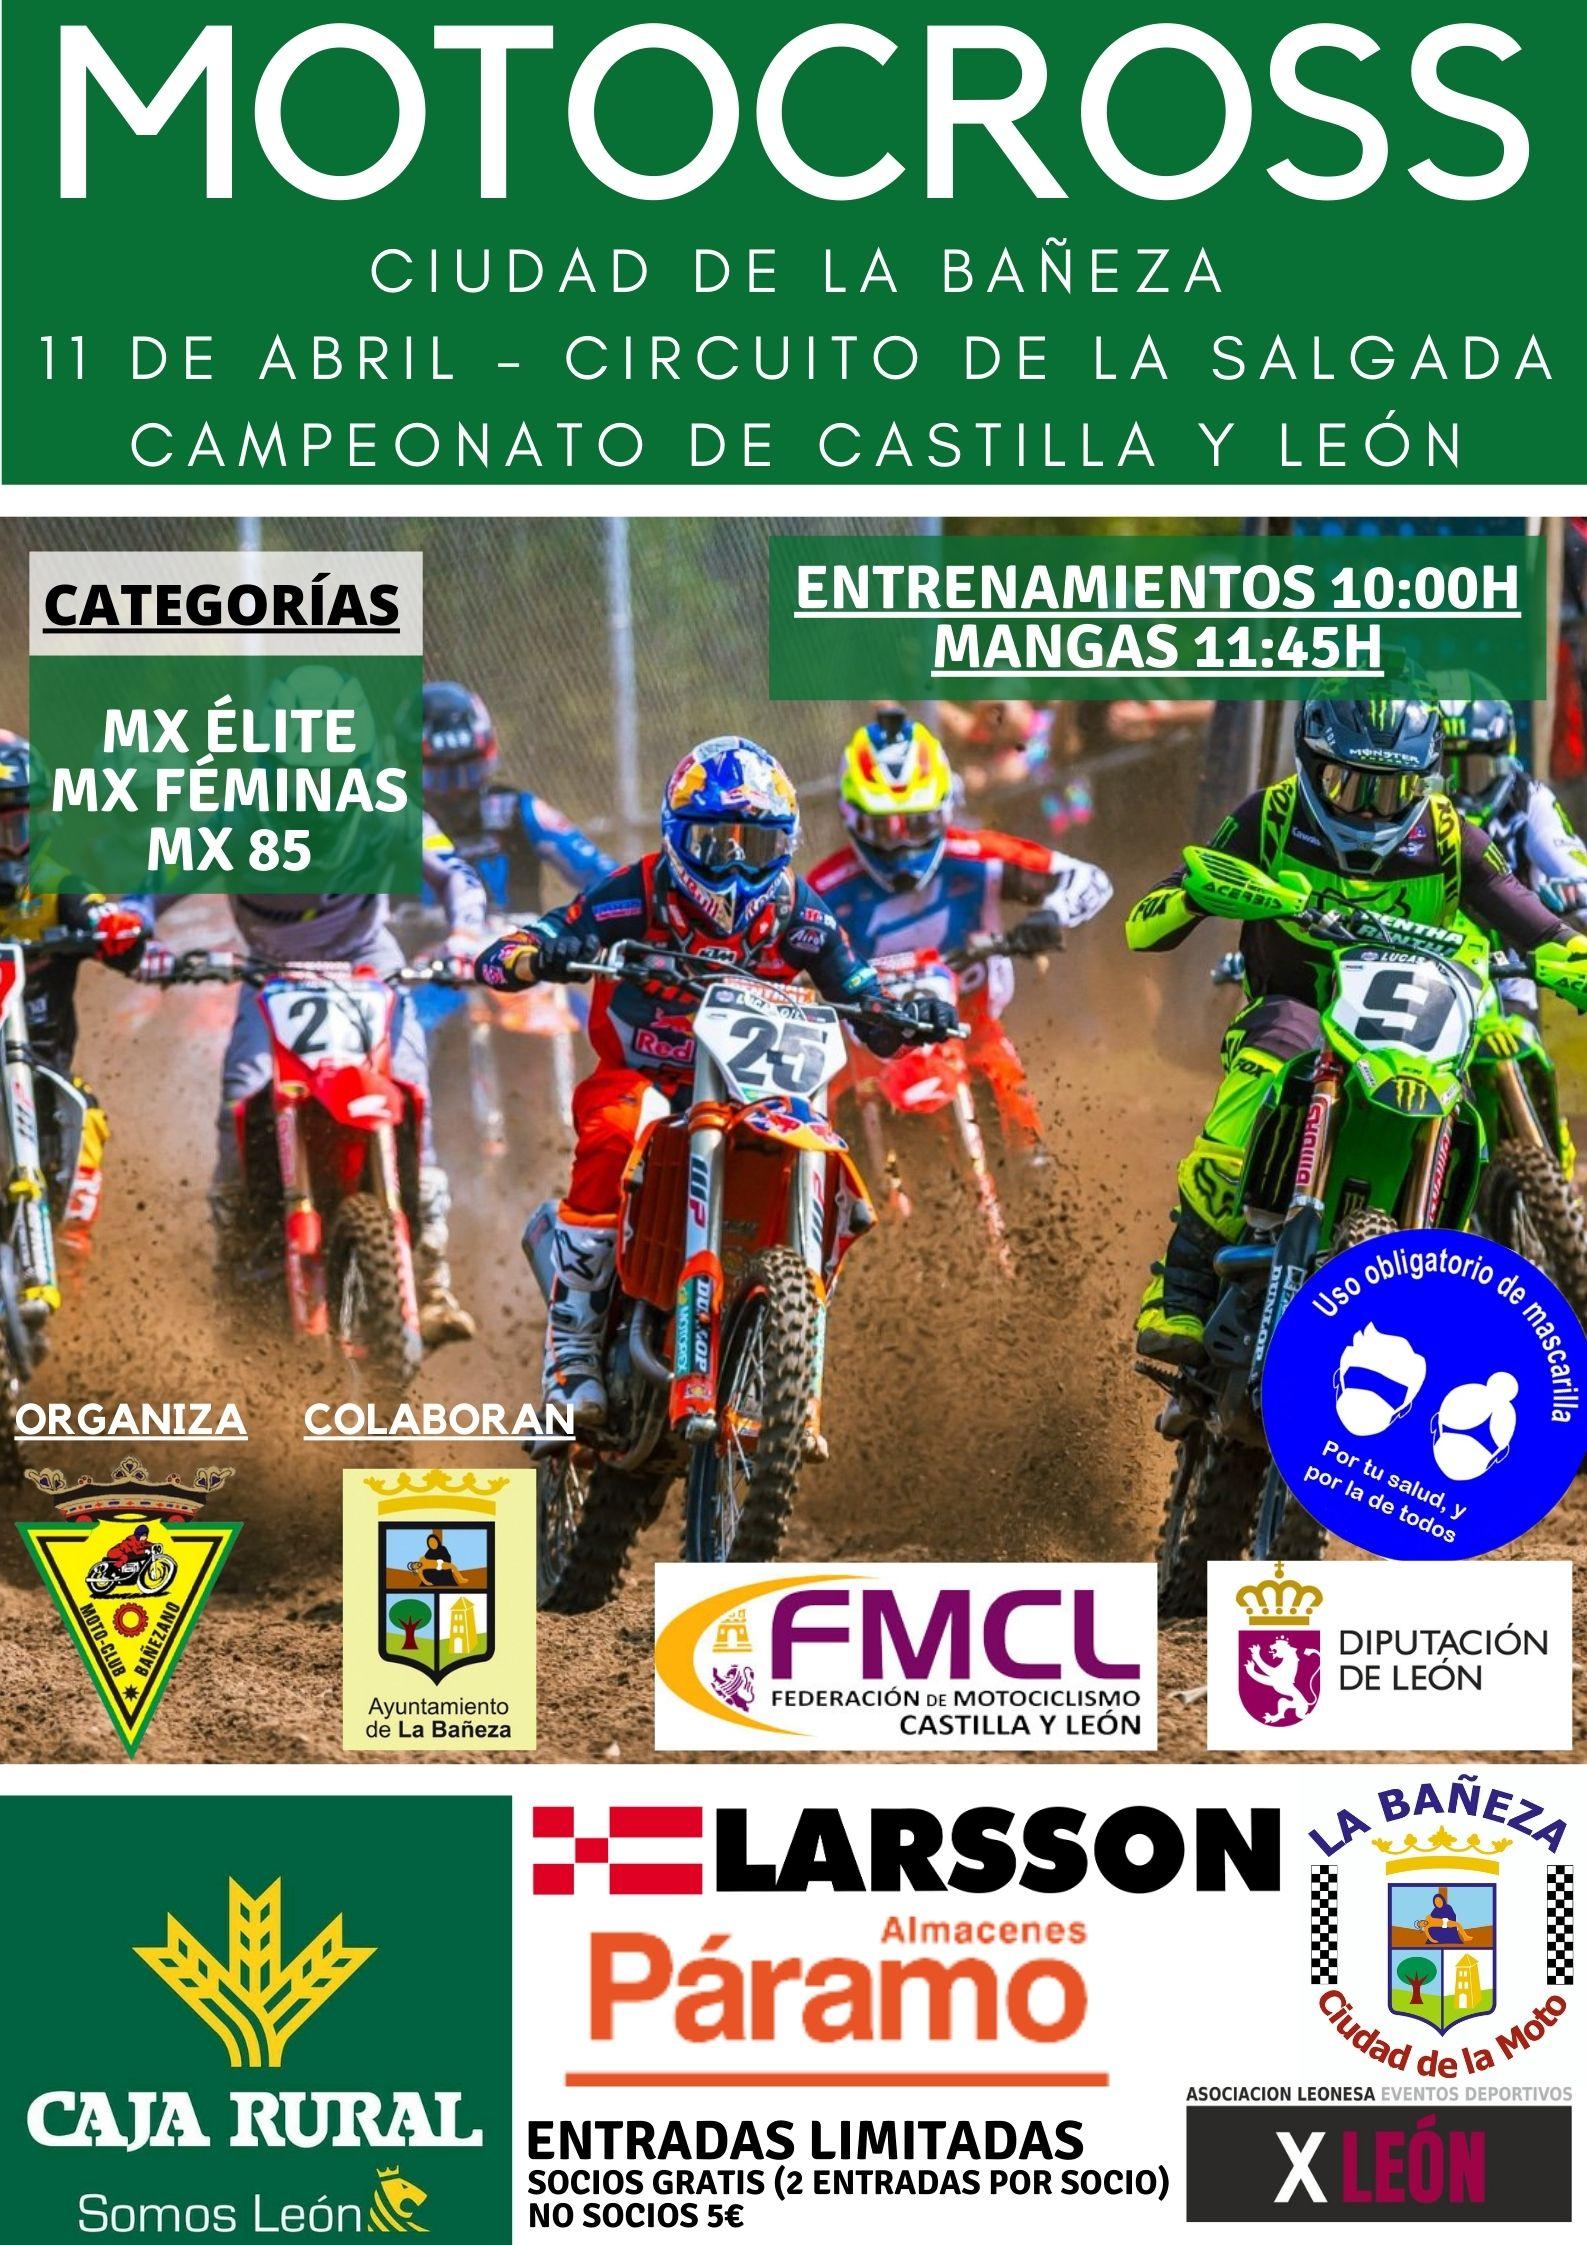 Campeonato de CyL de MX ÉLITE 2021